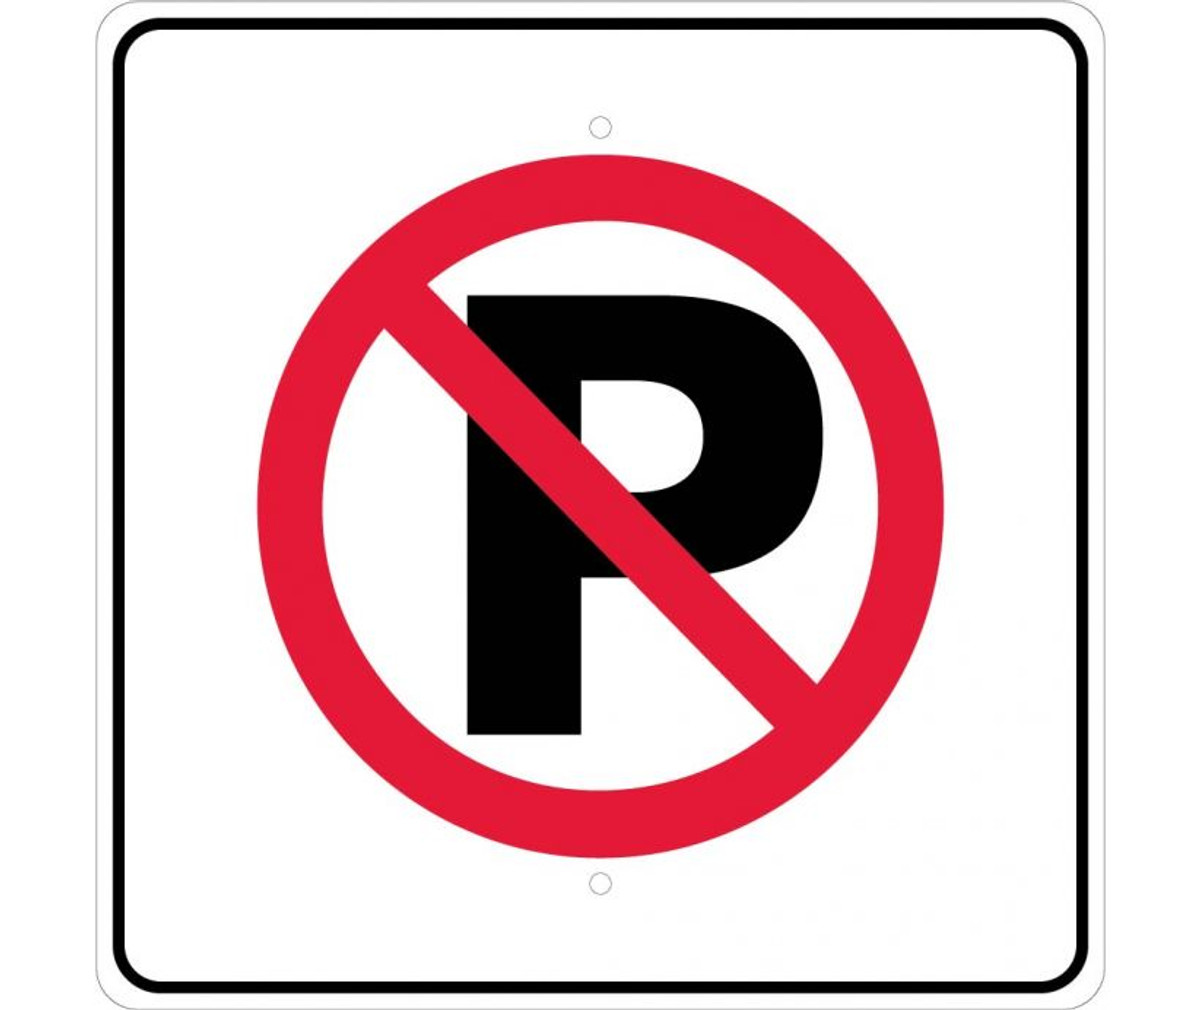 No Parking Symbol Metal Sign 12 wide x 18 tall Heavy Gauge Aluminum Reflective